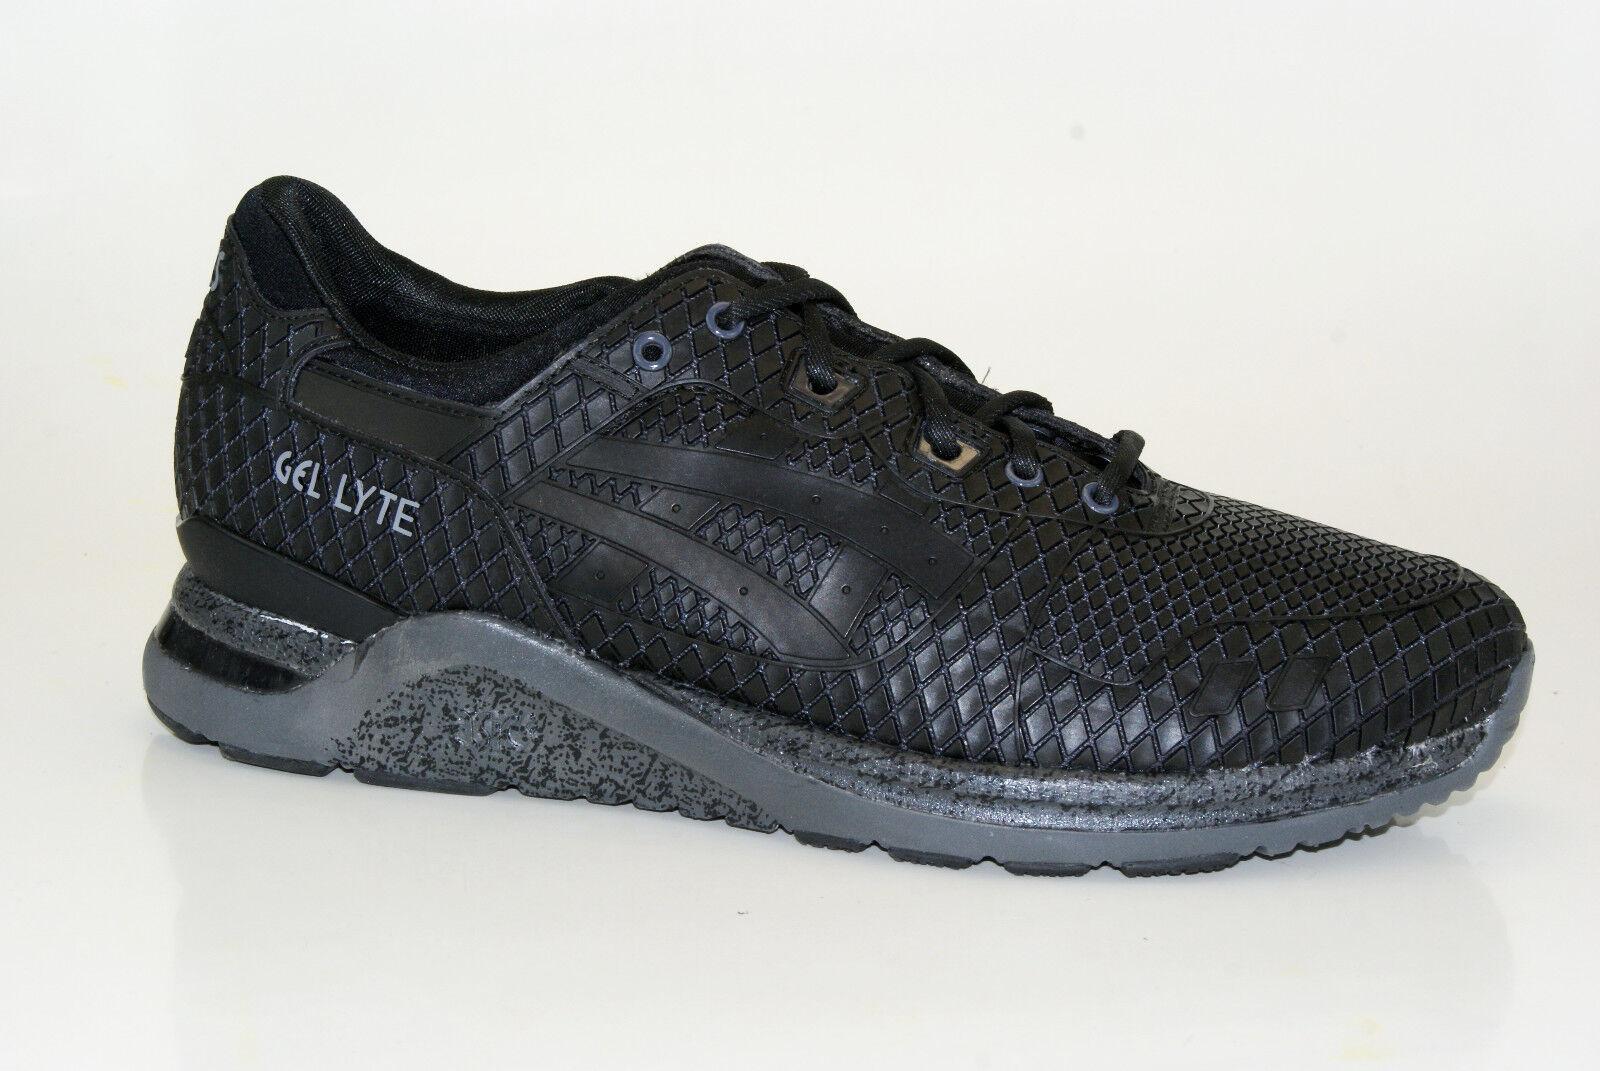 Asics Gel-Lyte Evo Samurai Pack Trainers Sneakers Men's shoes Hn543-9016